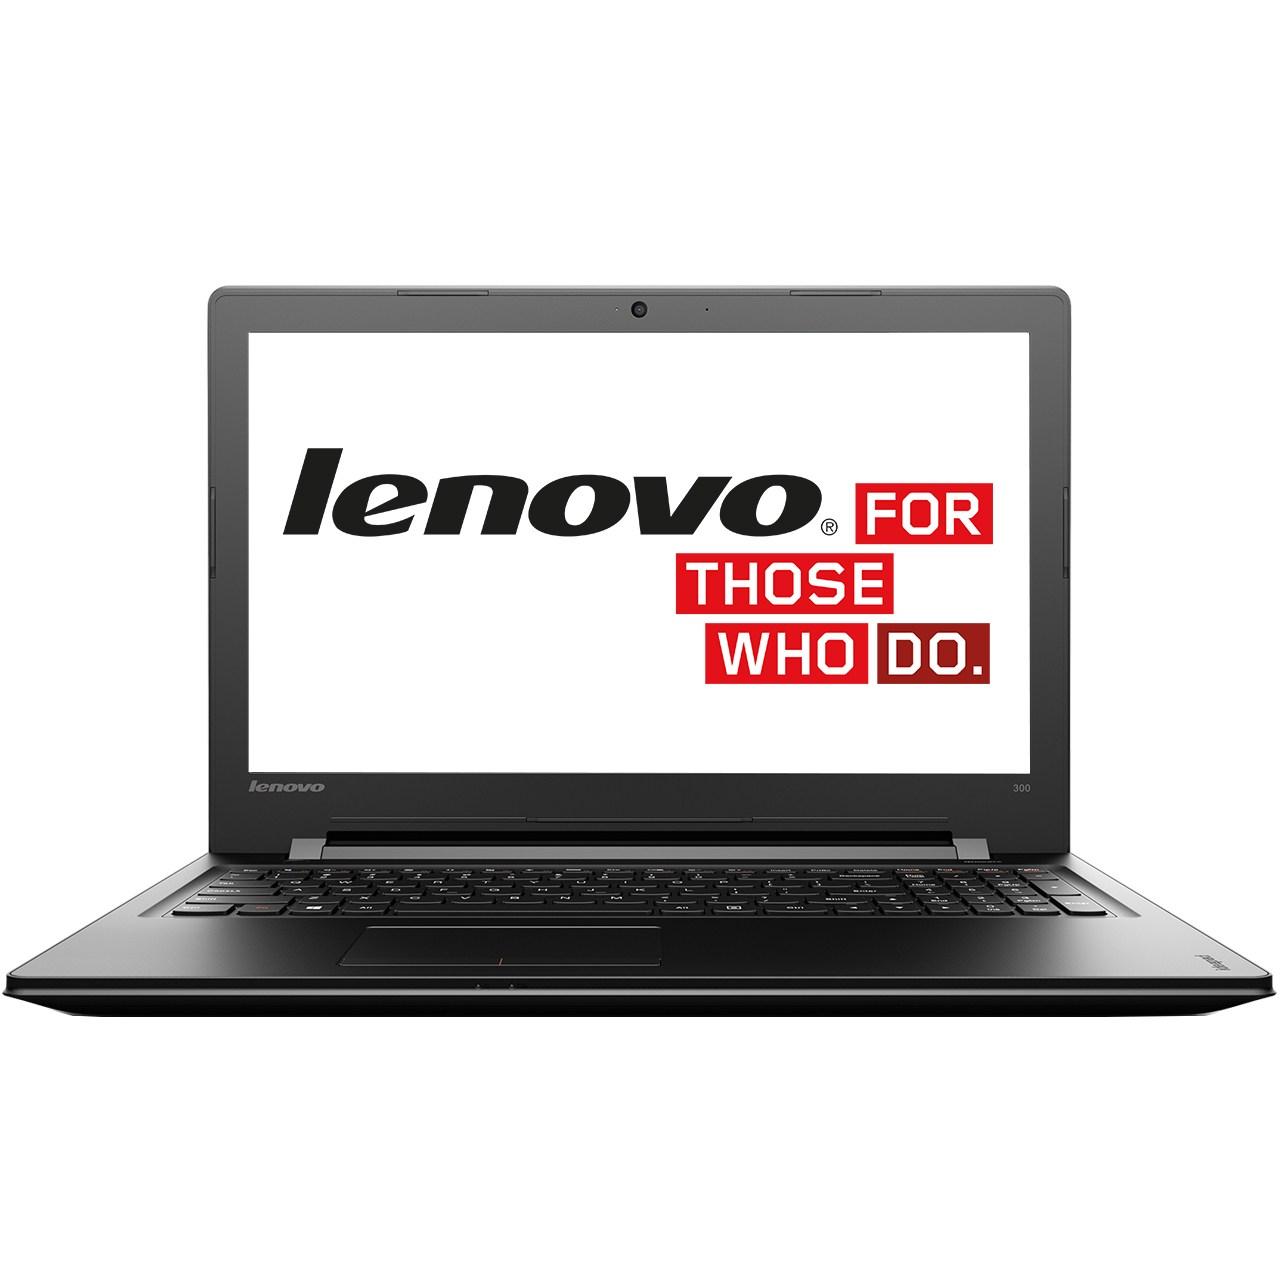 لپ تاپ 15 اینچی لنوو مدل Ideapad 300 - J